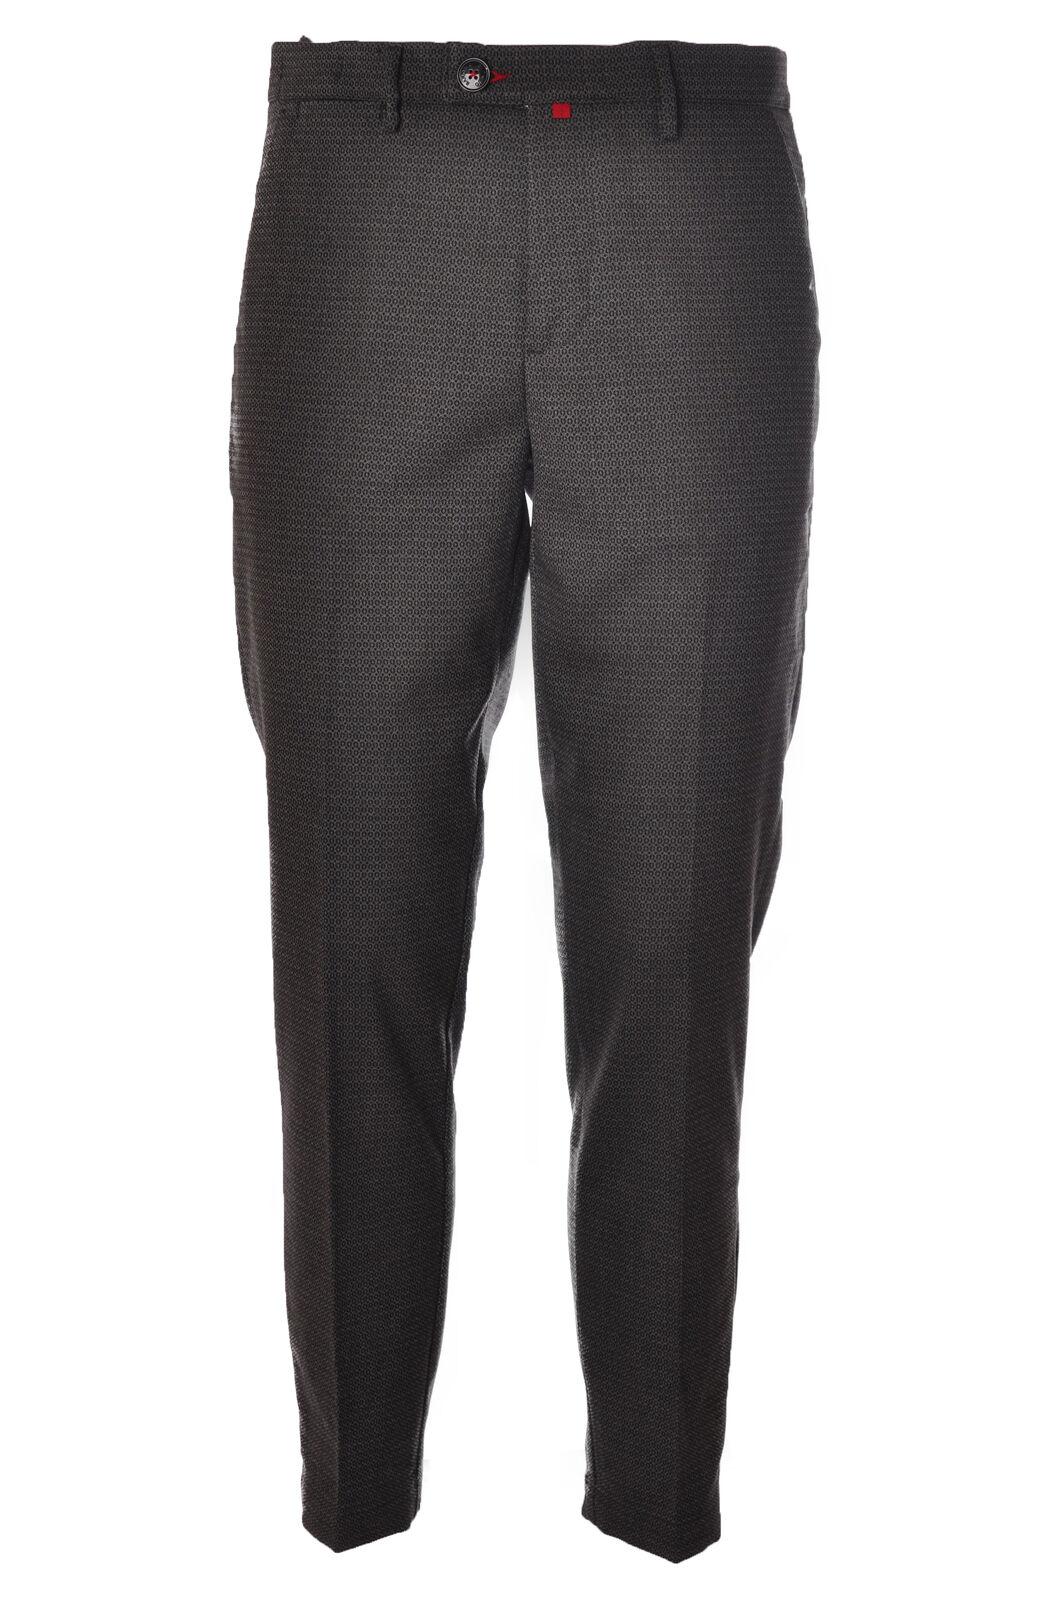 Baronio  -  Pants - Male - Grey - 2560226N173755